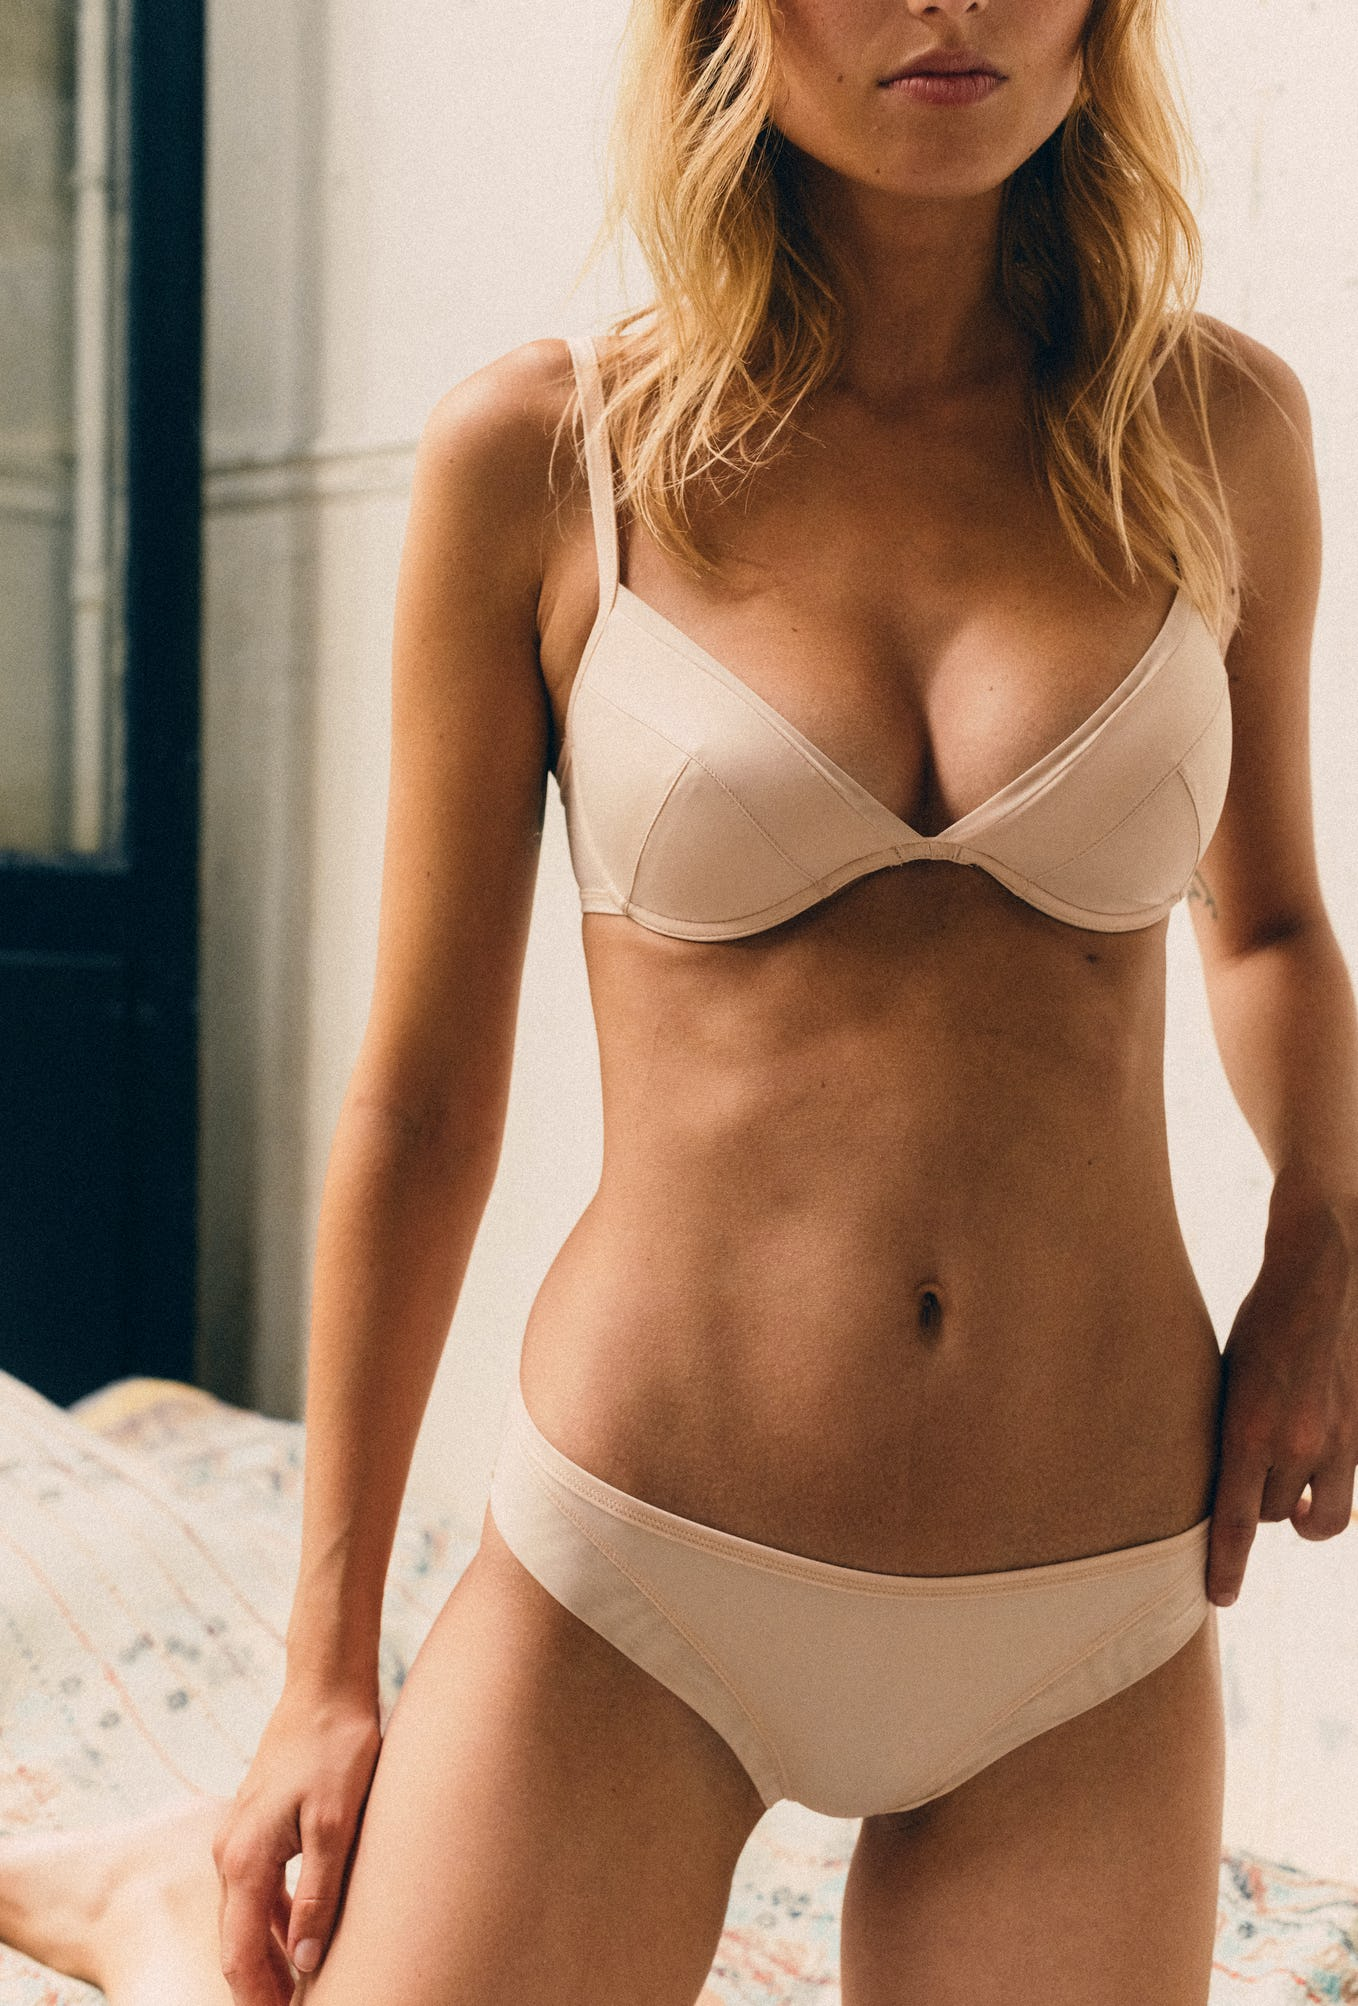 Push-up bra Histoire de femmes